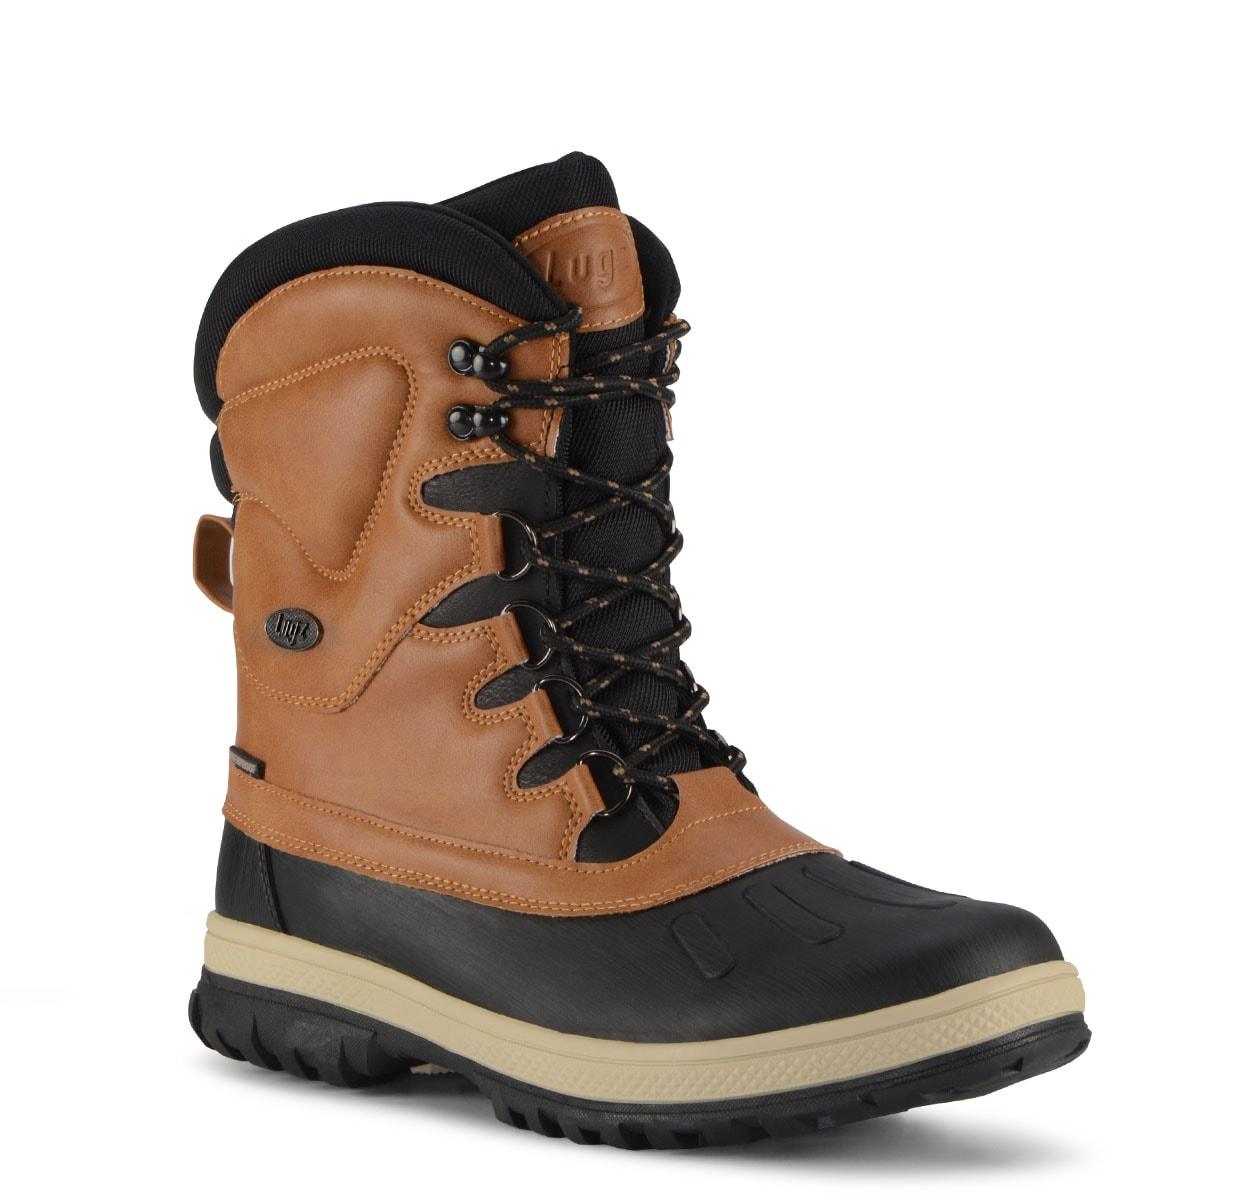 Men's Anorak 8-Inch Waterproof Boot (Choose Your Color: PEANUT/BLACK/CREAM, Choose Your Size: 9.5)